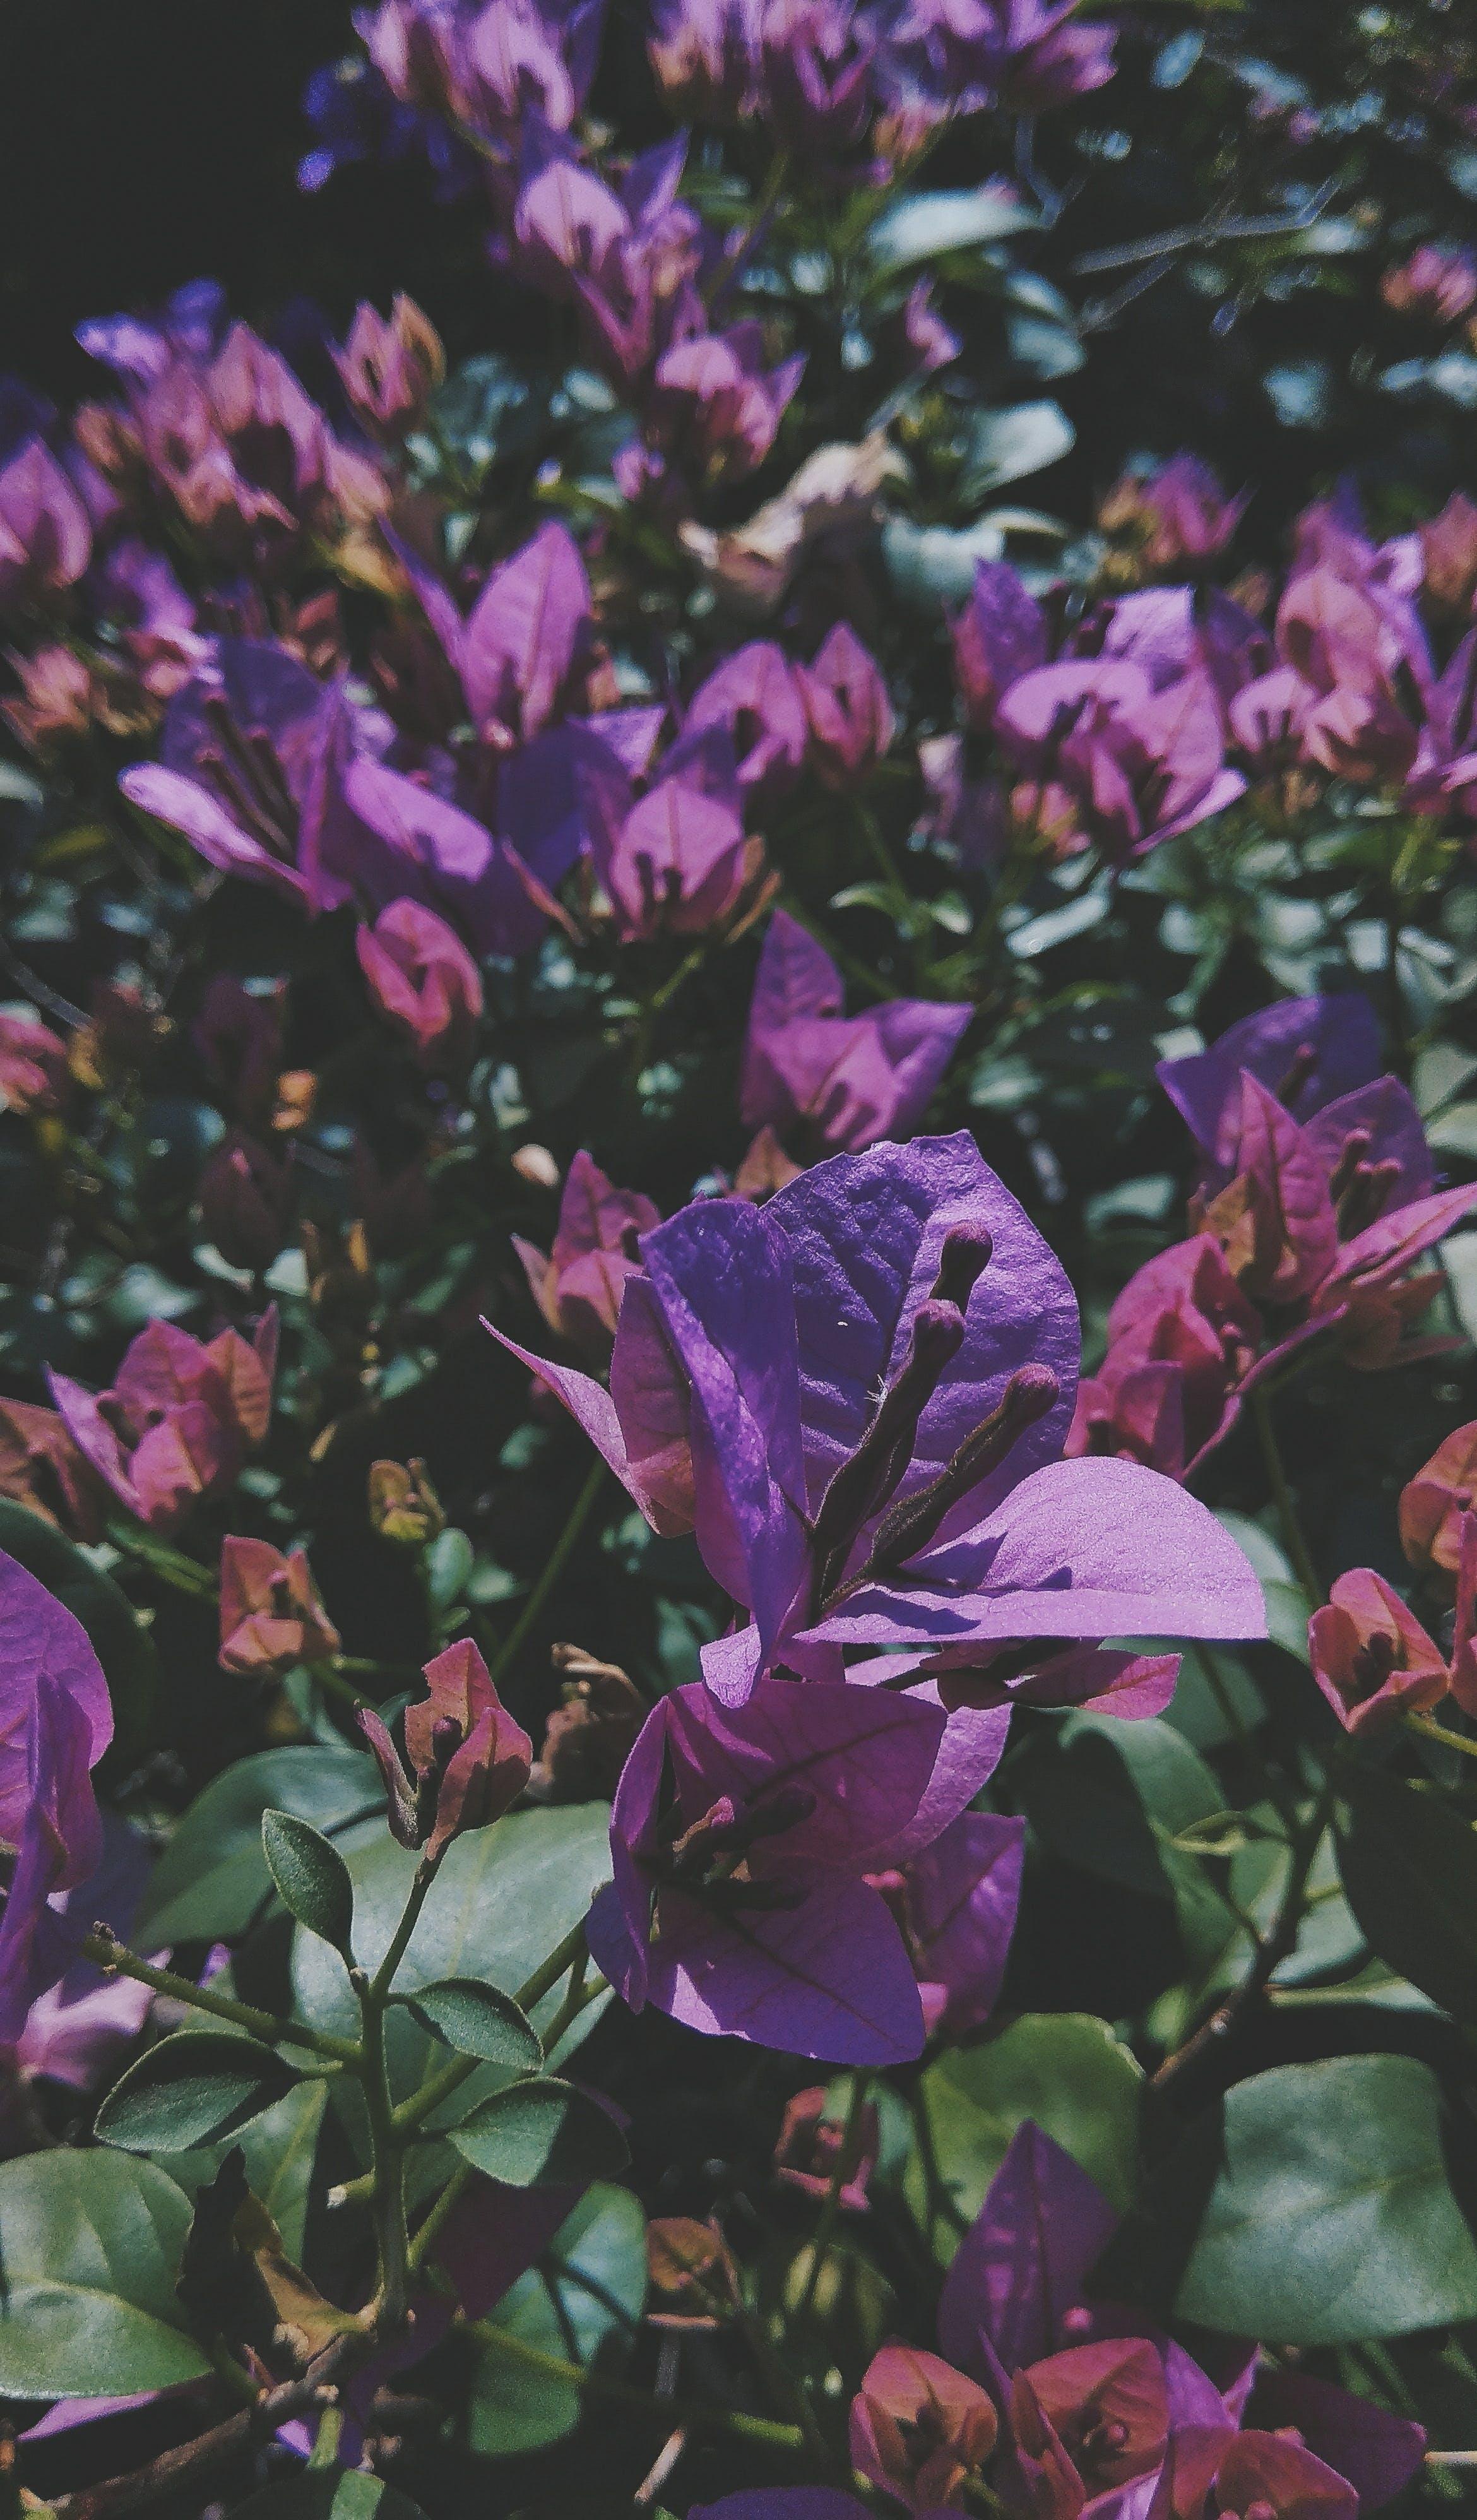 Free stock photo of nature, garden, india, fresh